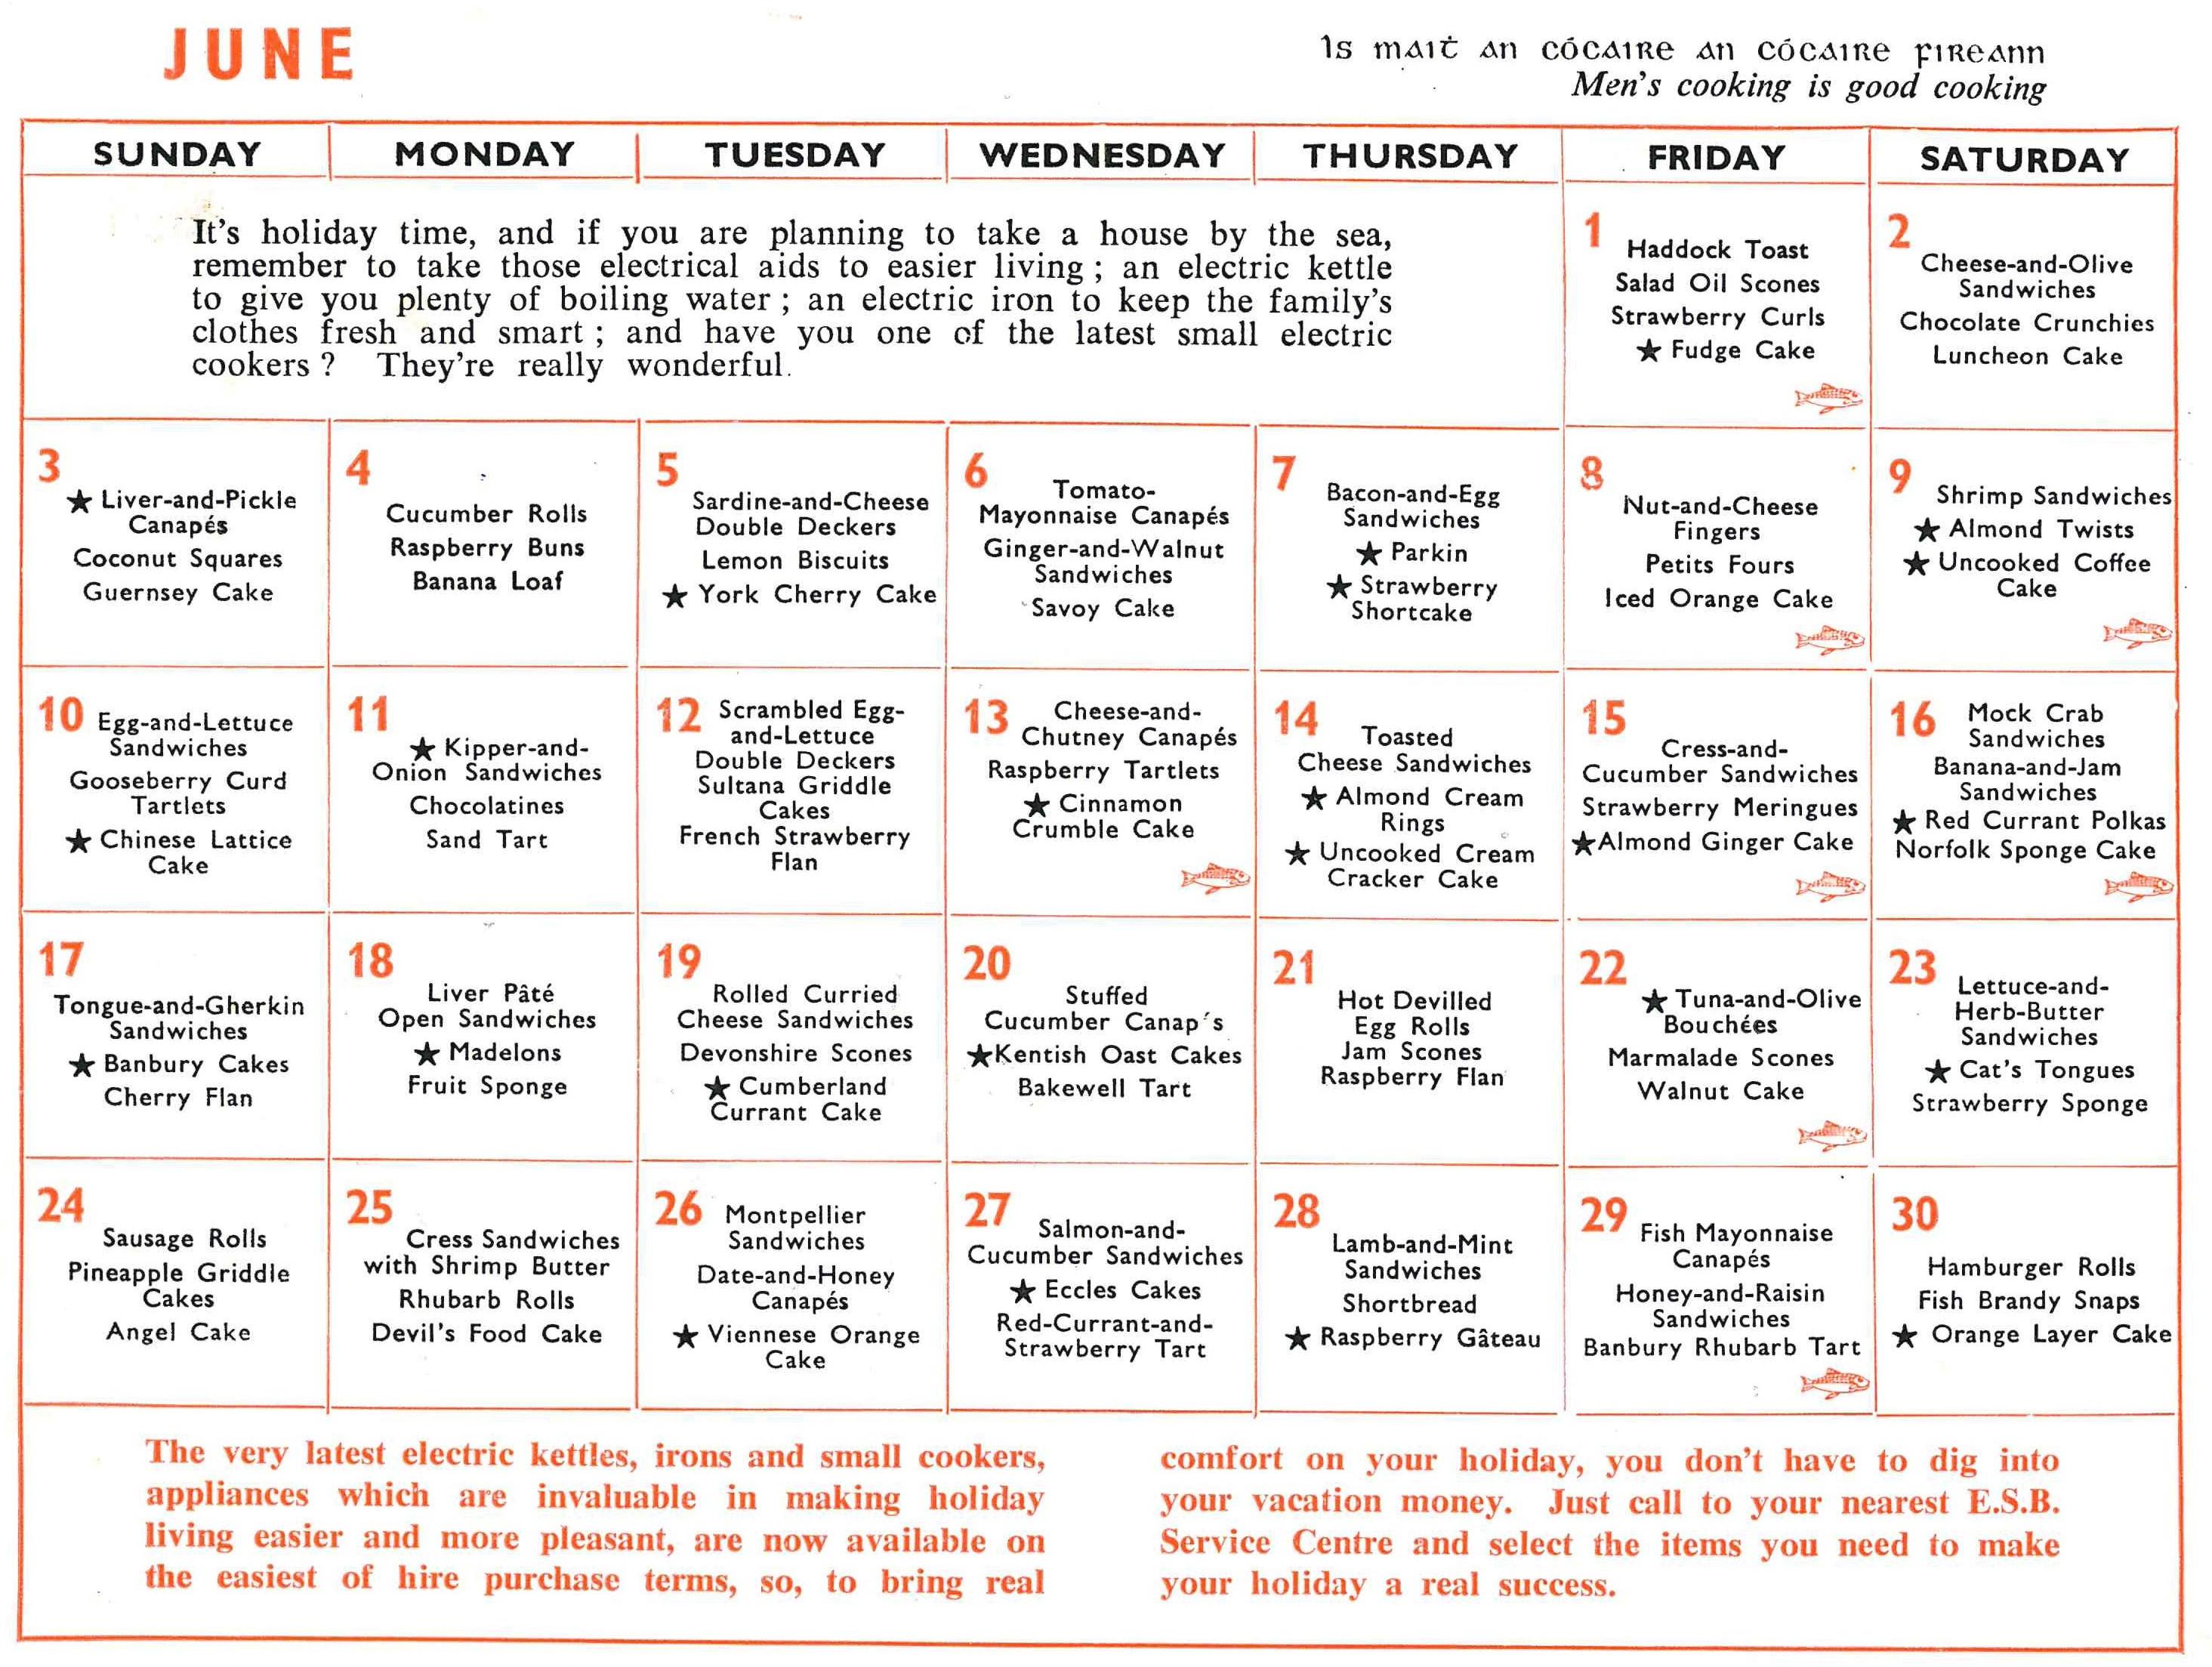 Esb Housewives Calendar Jun 1962 Archives Brilliant Nasionalis3abry